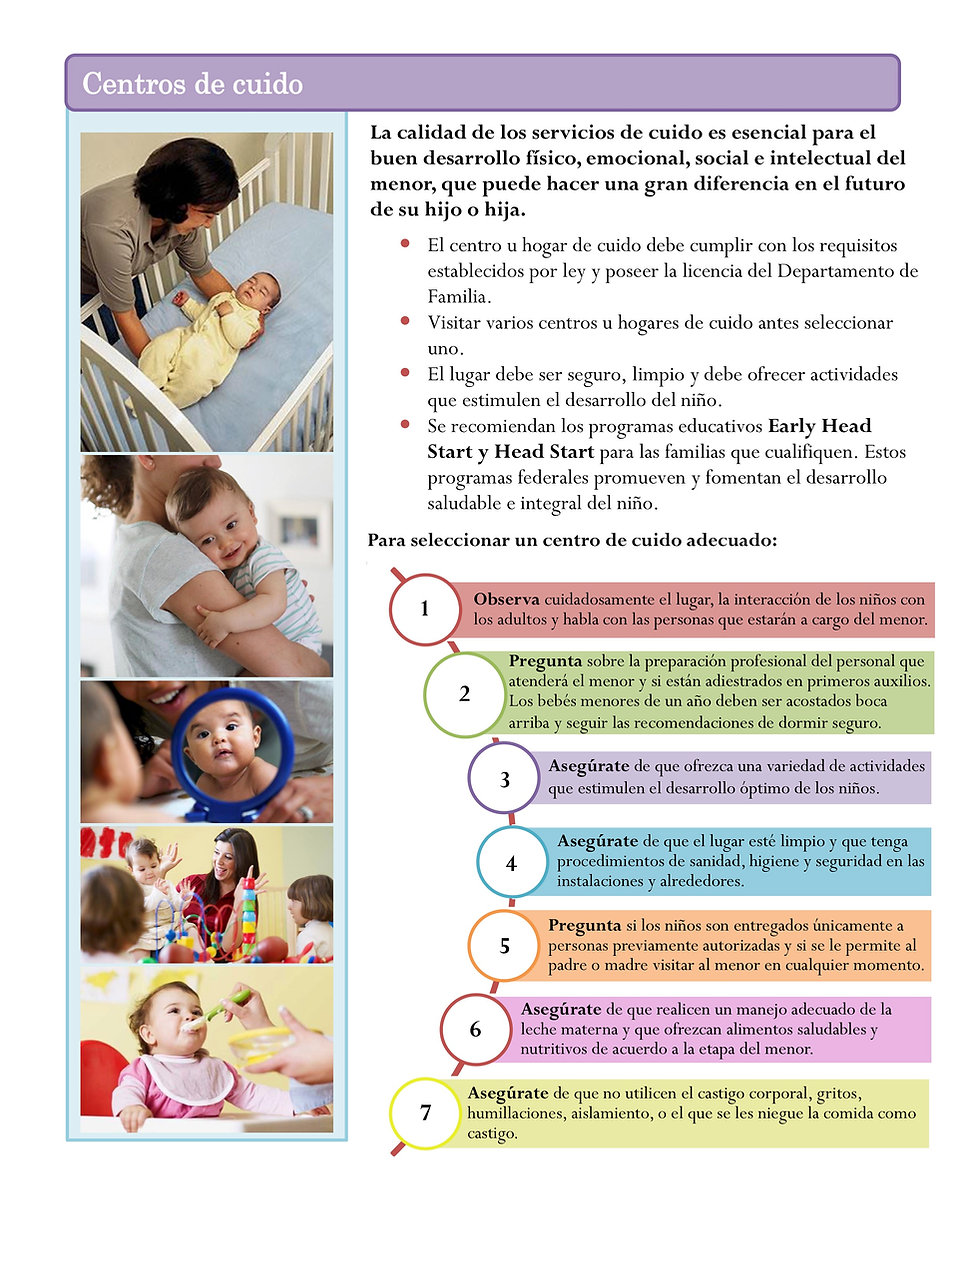 13. Centros de cuido.jpg